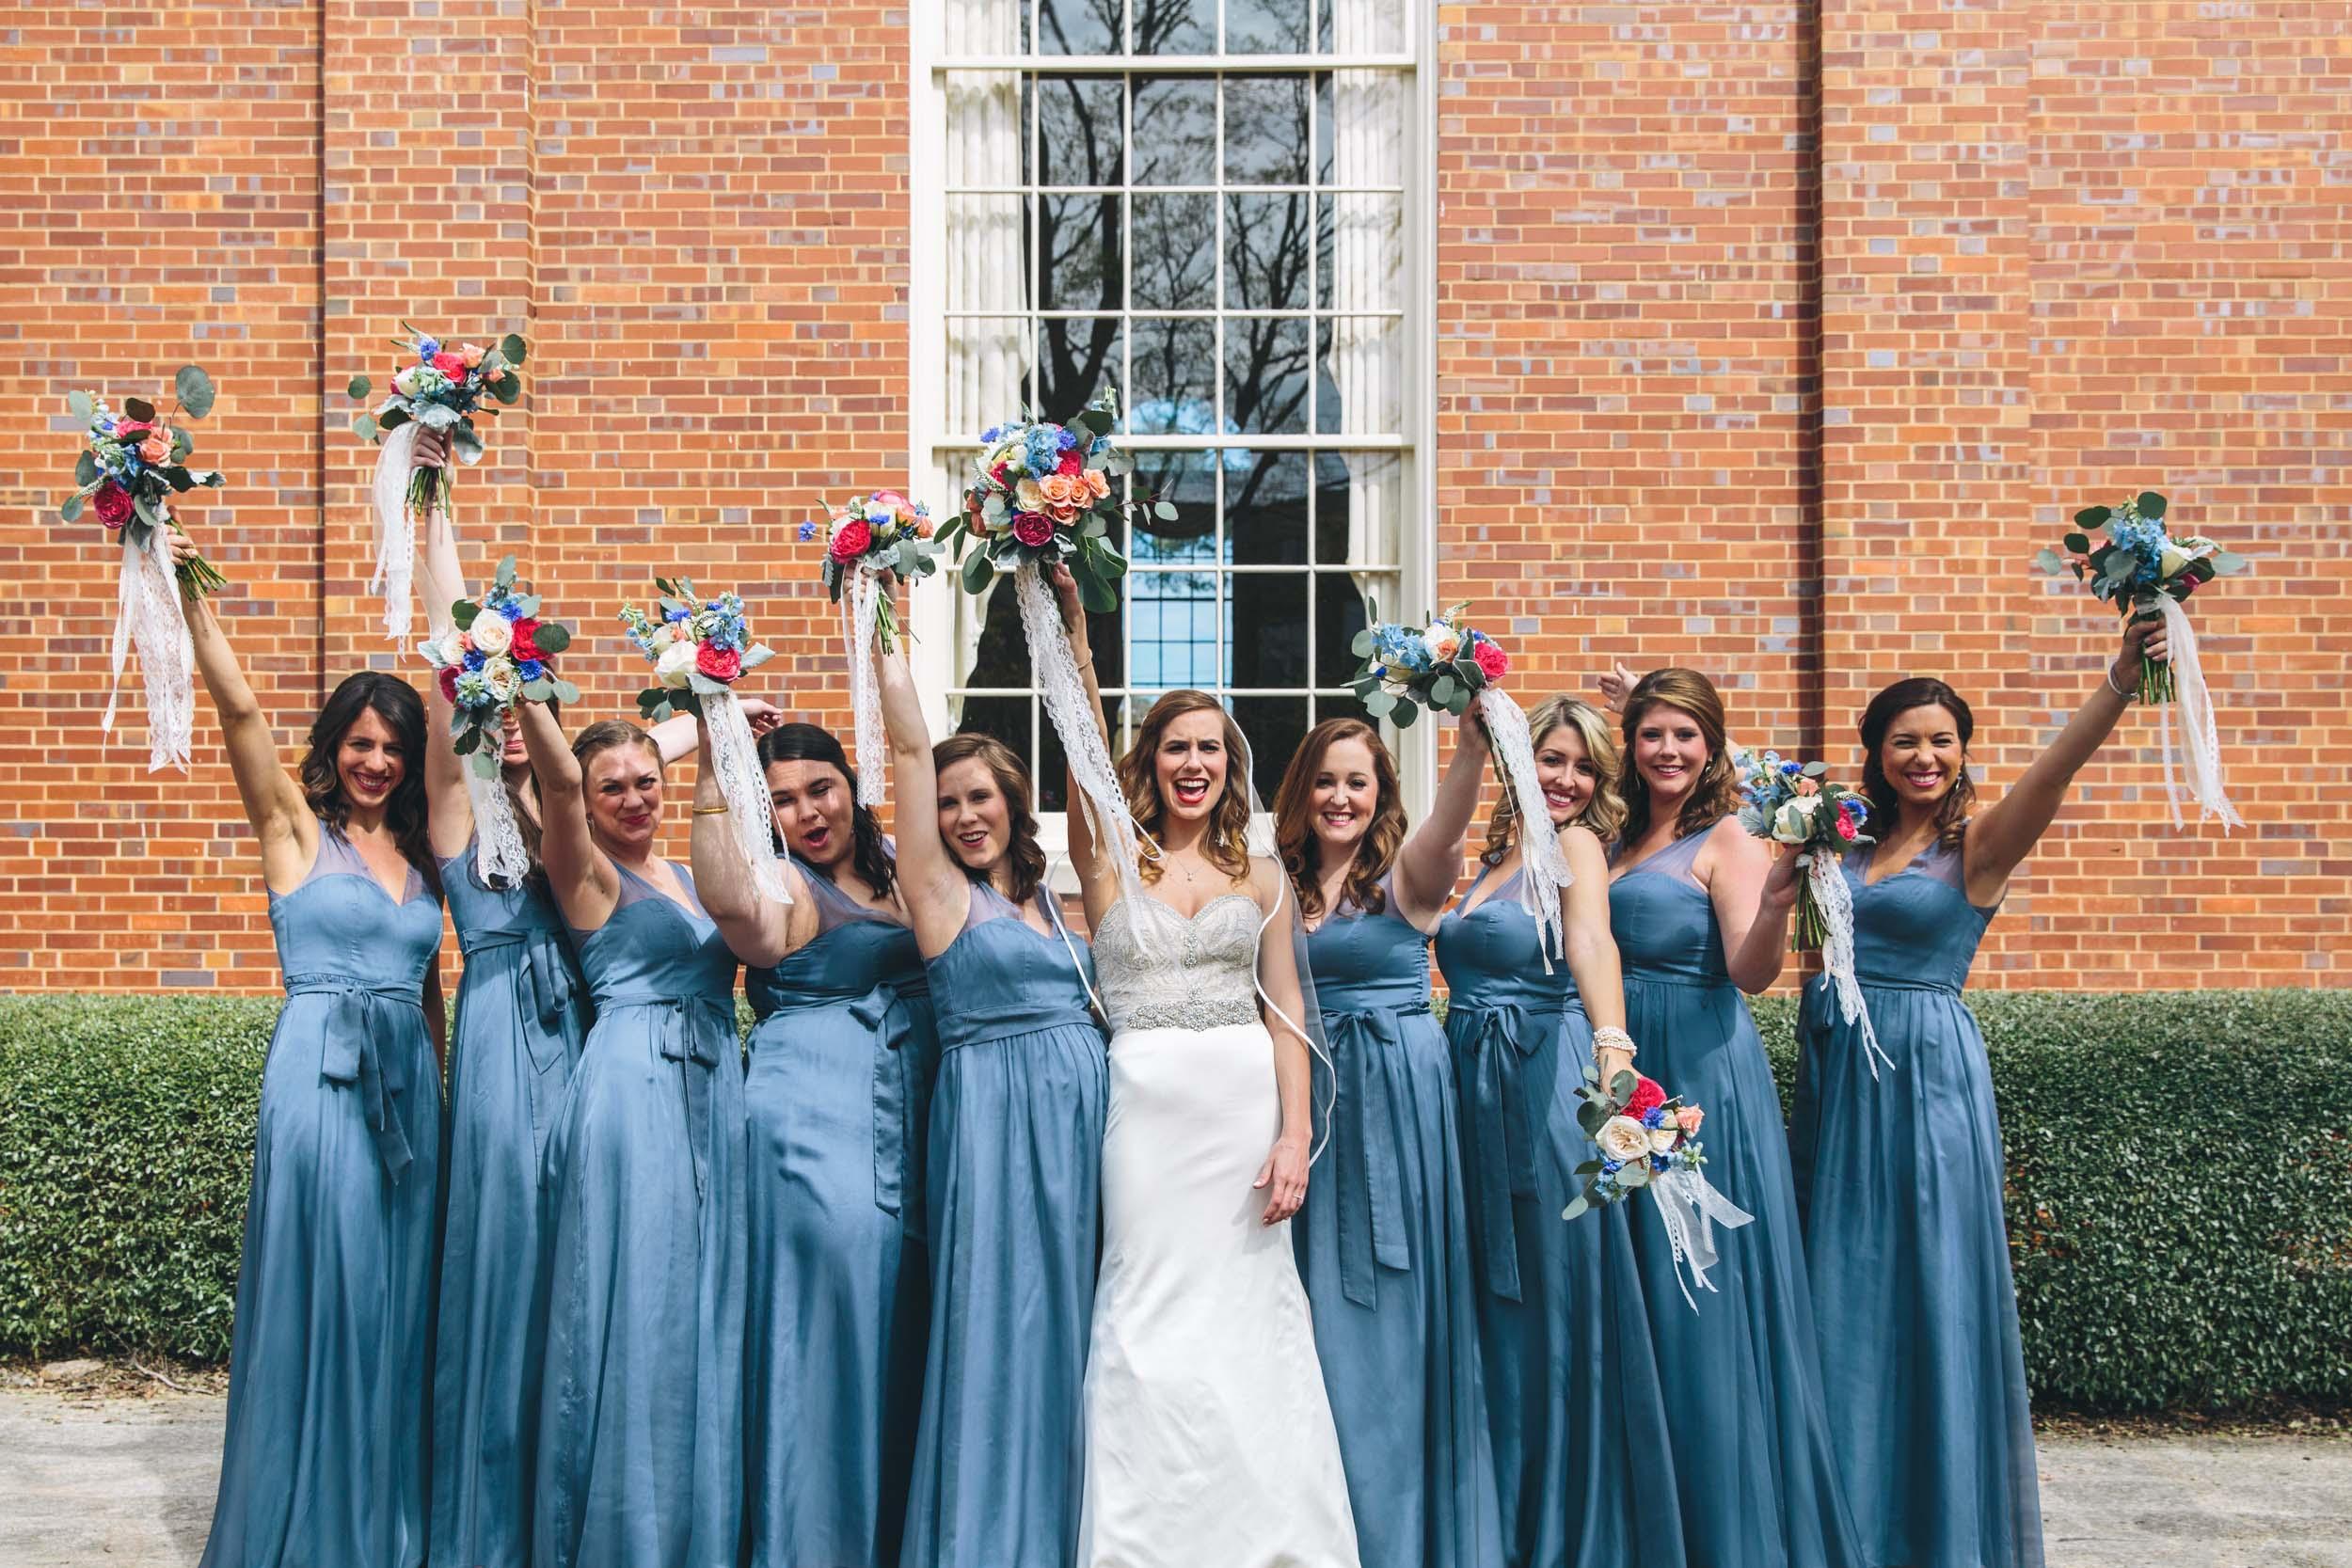 jimmy-rowalt-atlanta-wedding-photography-023.jpg